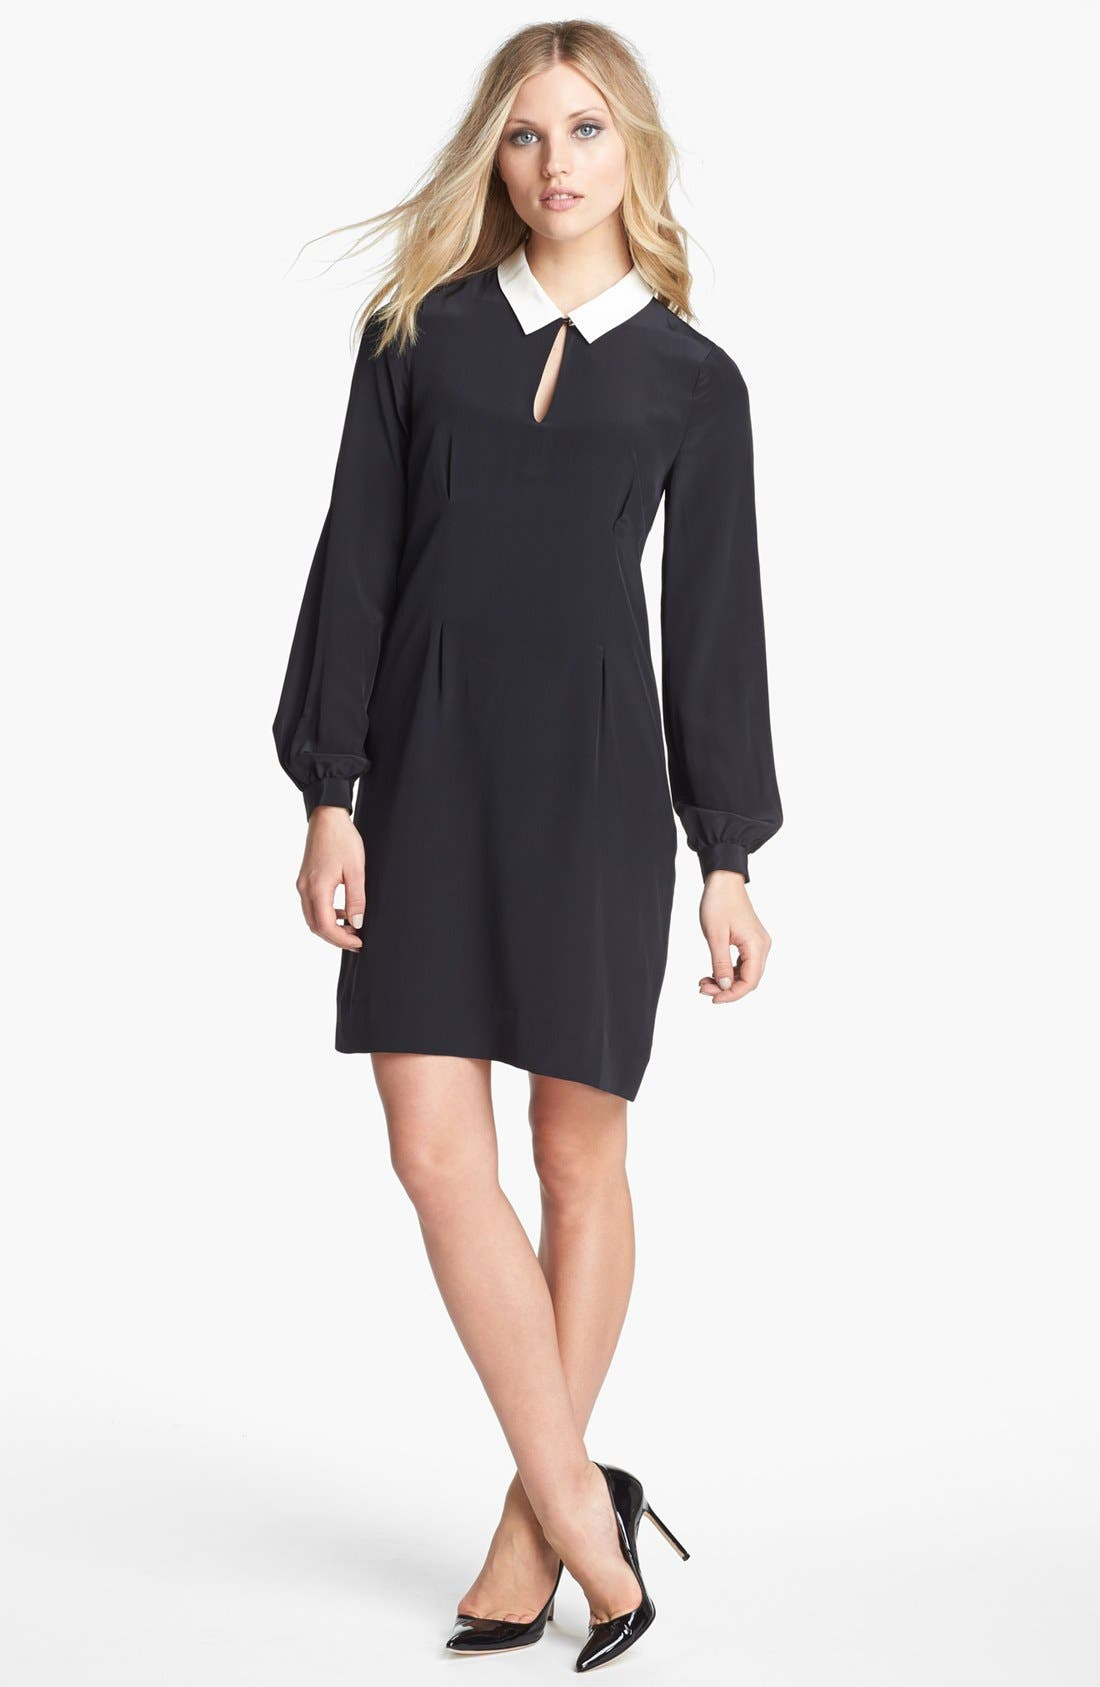 Alternate Image 1 Selected - kate spade new york 'catarina' silk sheath dress